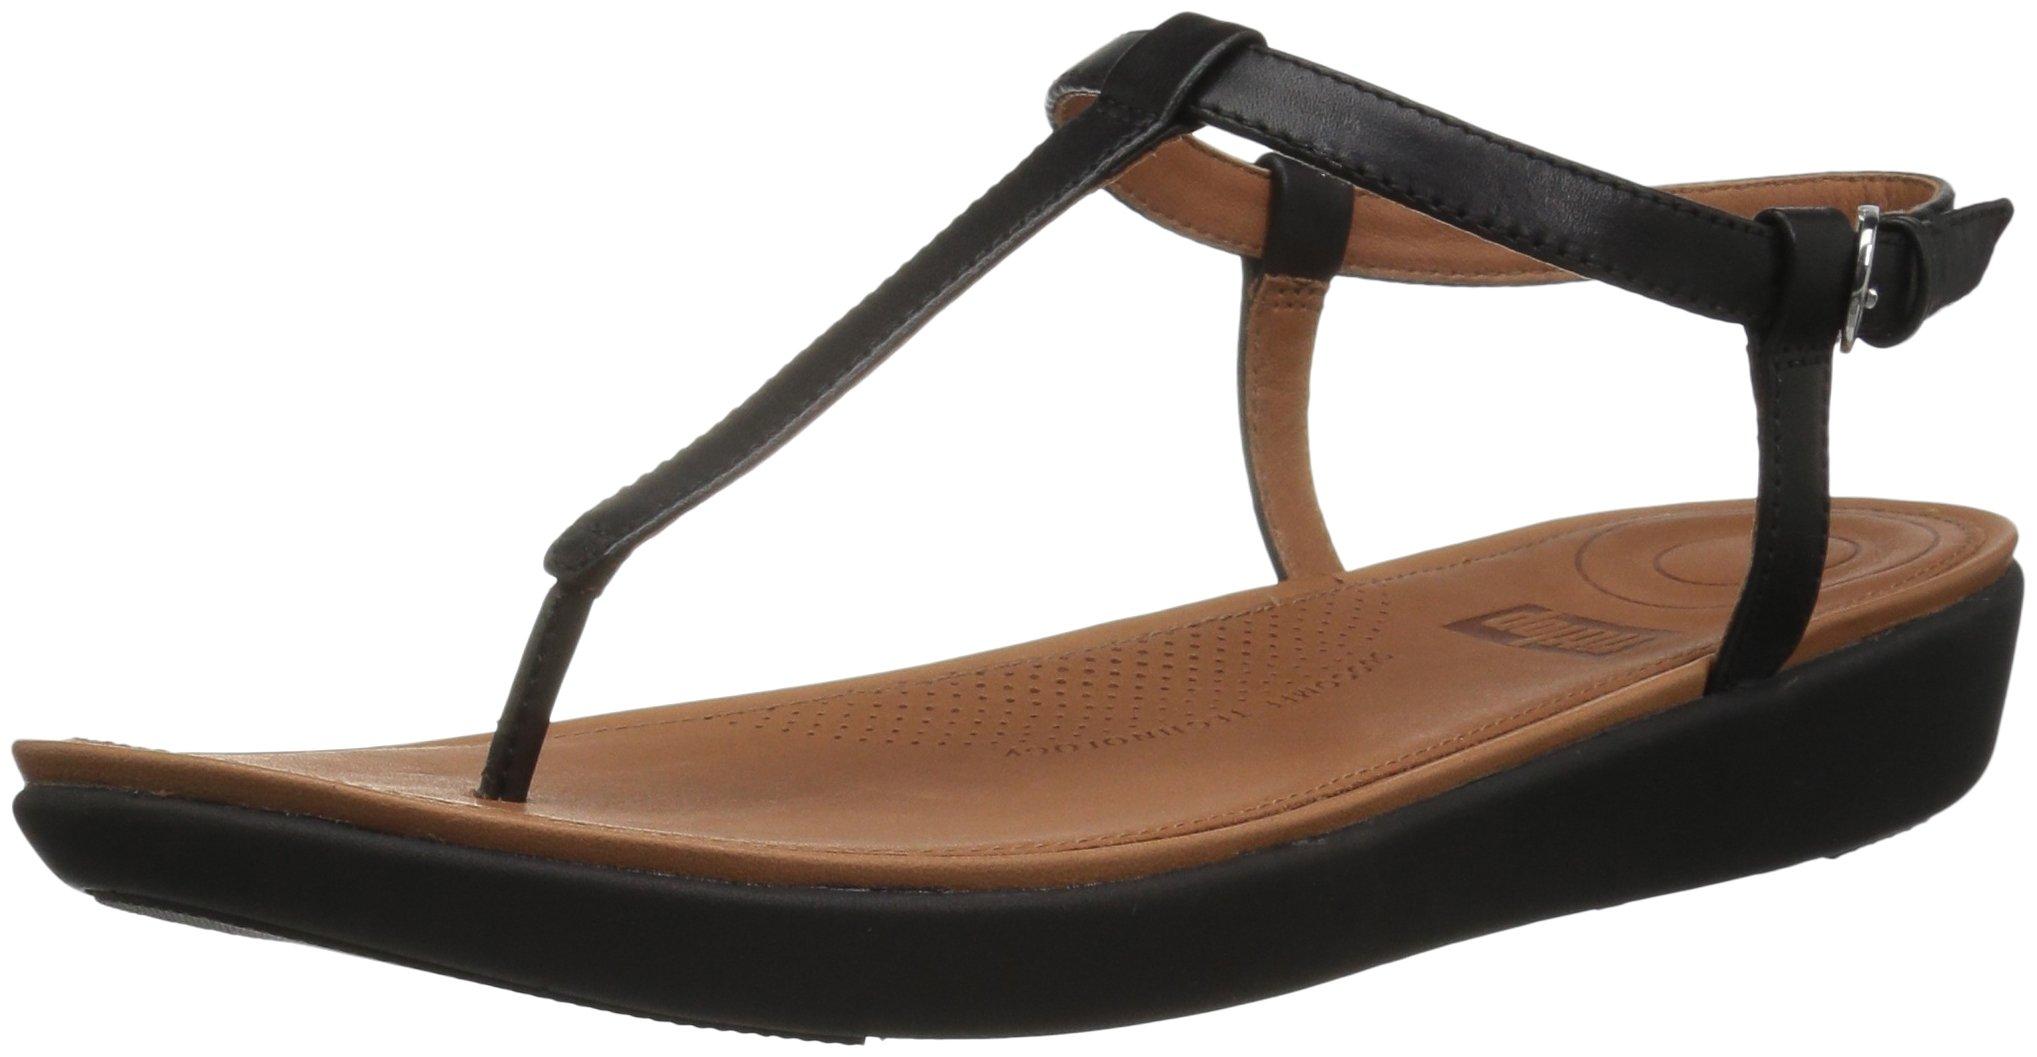 Toe Tia Eu Fitflop leatherBout FemmeNoirblack 00143 Sandals thong Ouvert tsxhQdrC